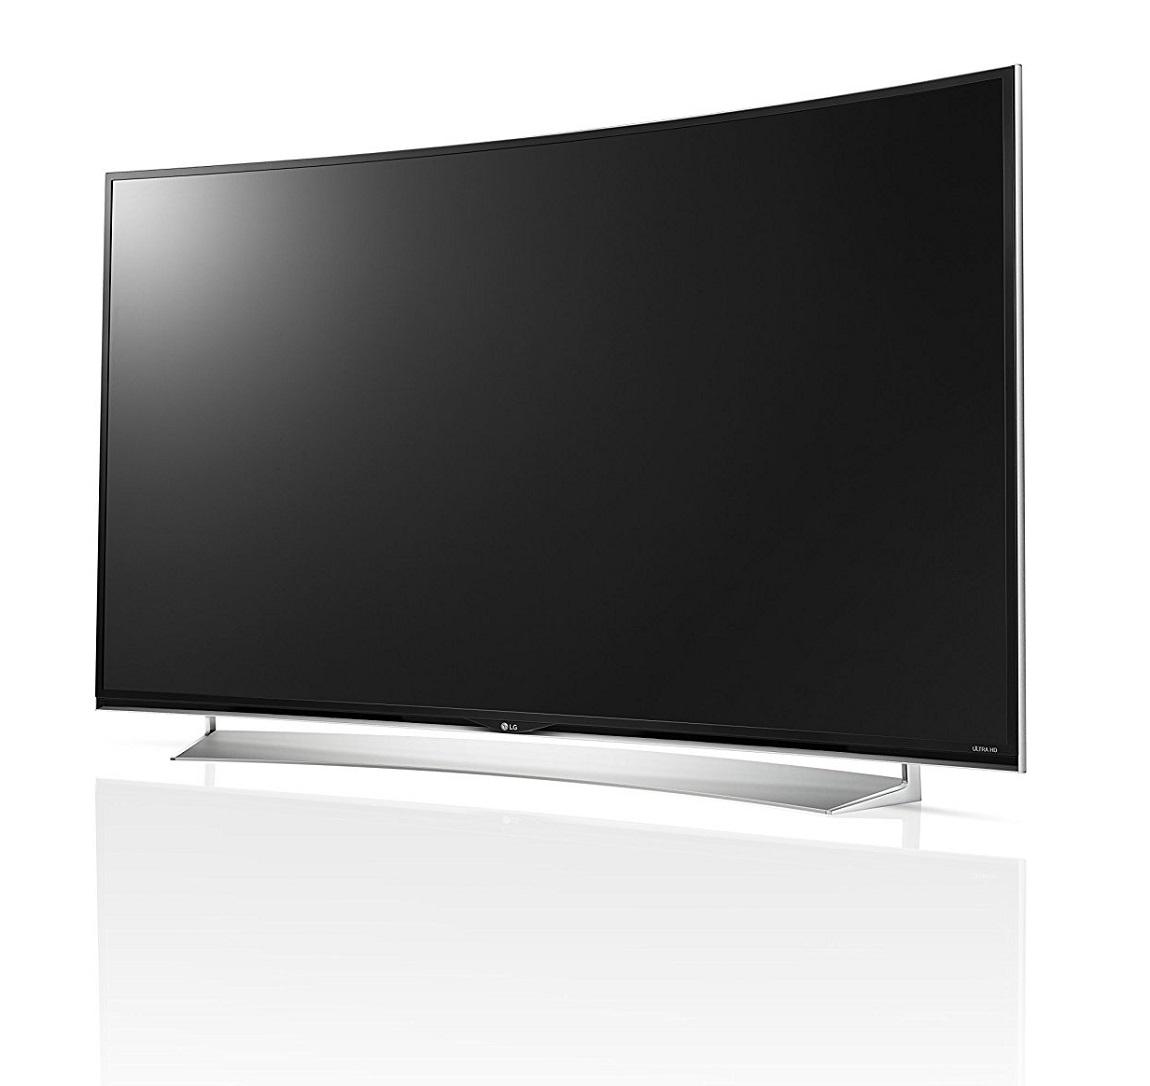 d606a396ed08 This item Samsung Electronics UN65MU 65-Inch 4K Ultra HD Smart LED TV Model  Samsung Electronics UN32M4500A 32-Inch 720p Smart LED TV Model Samsung ...